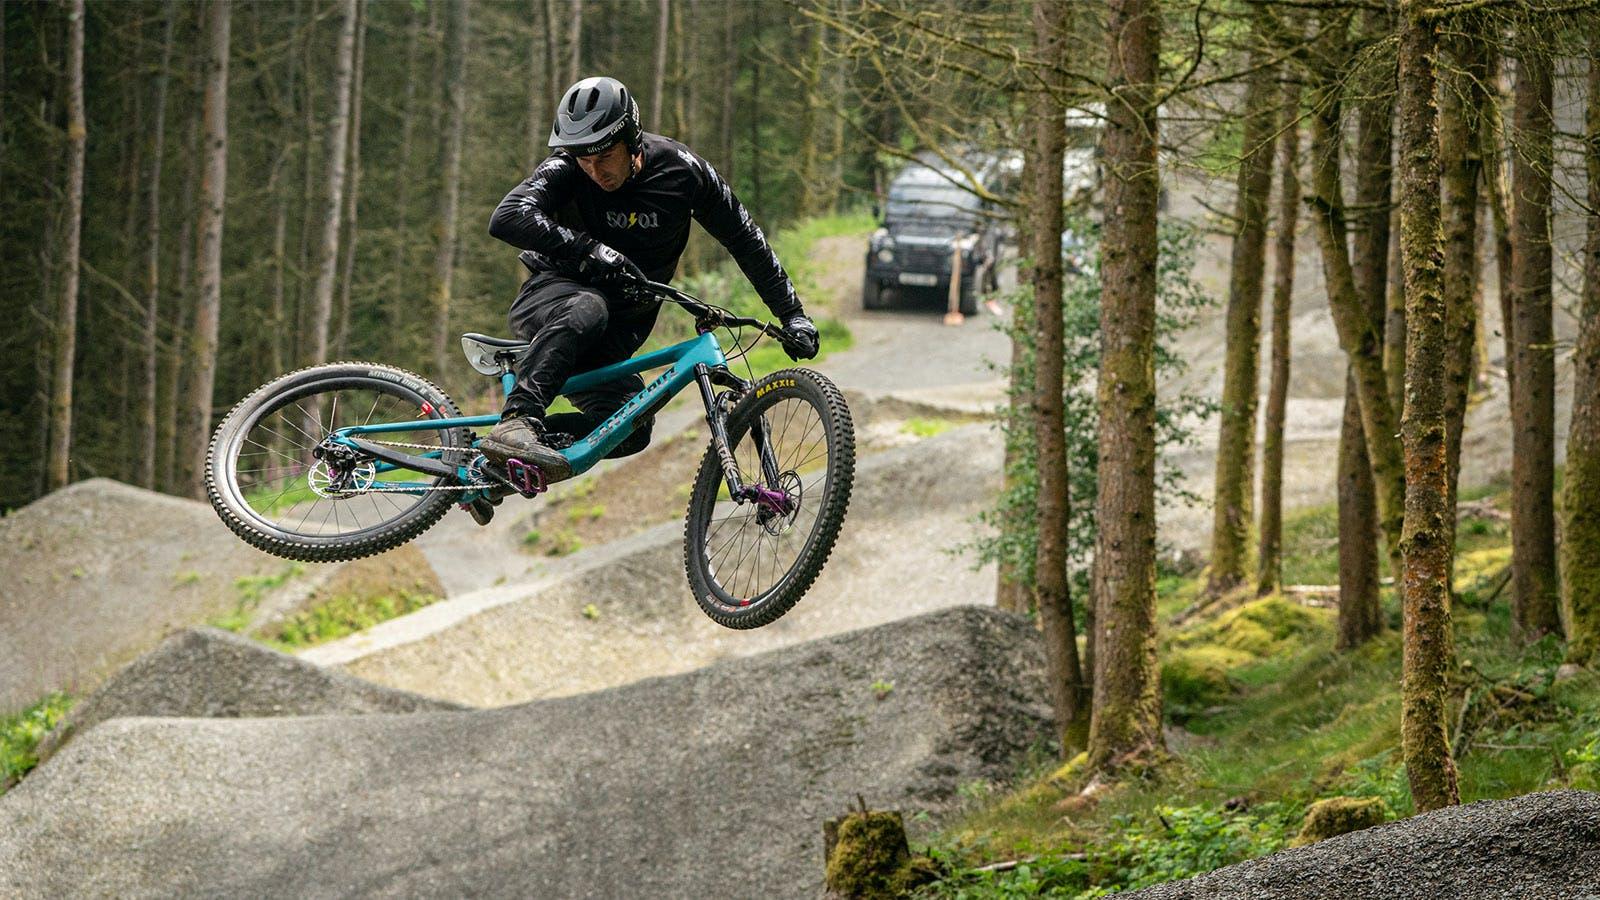 Free Agent rider Josh Lewis jumping his 5010